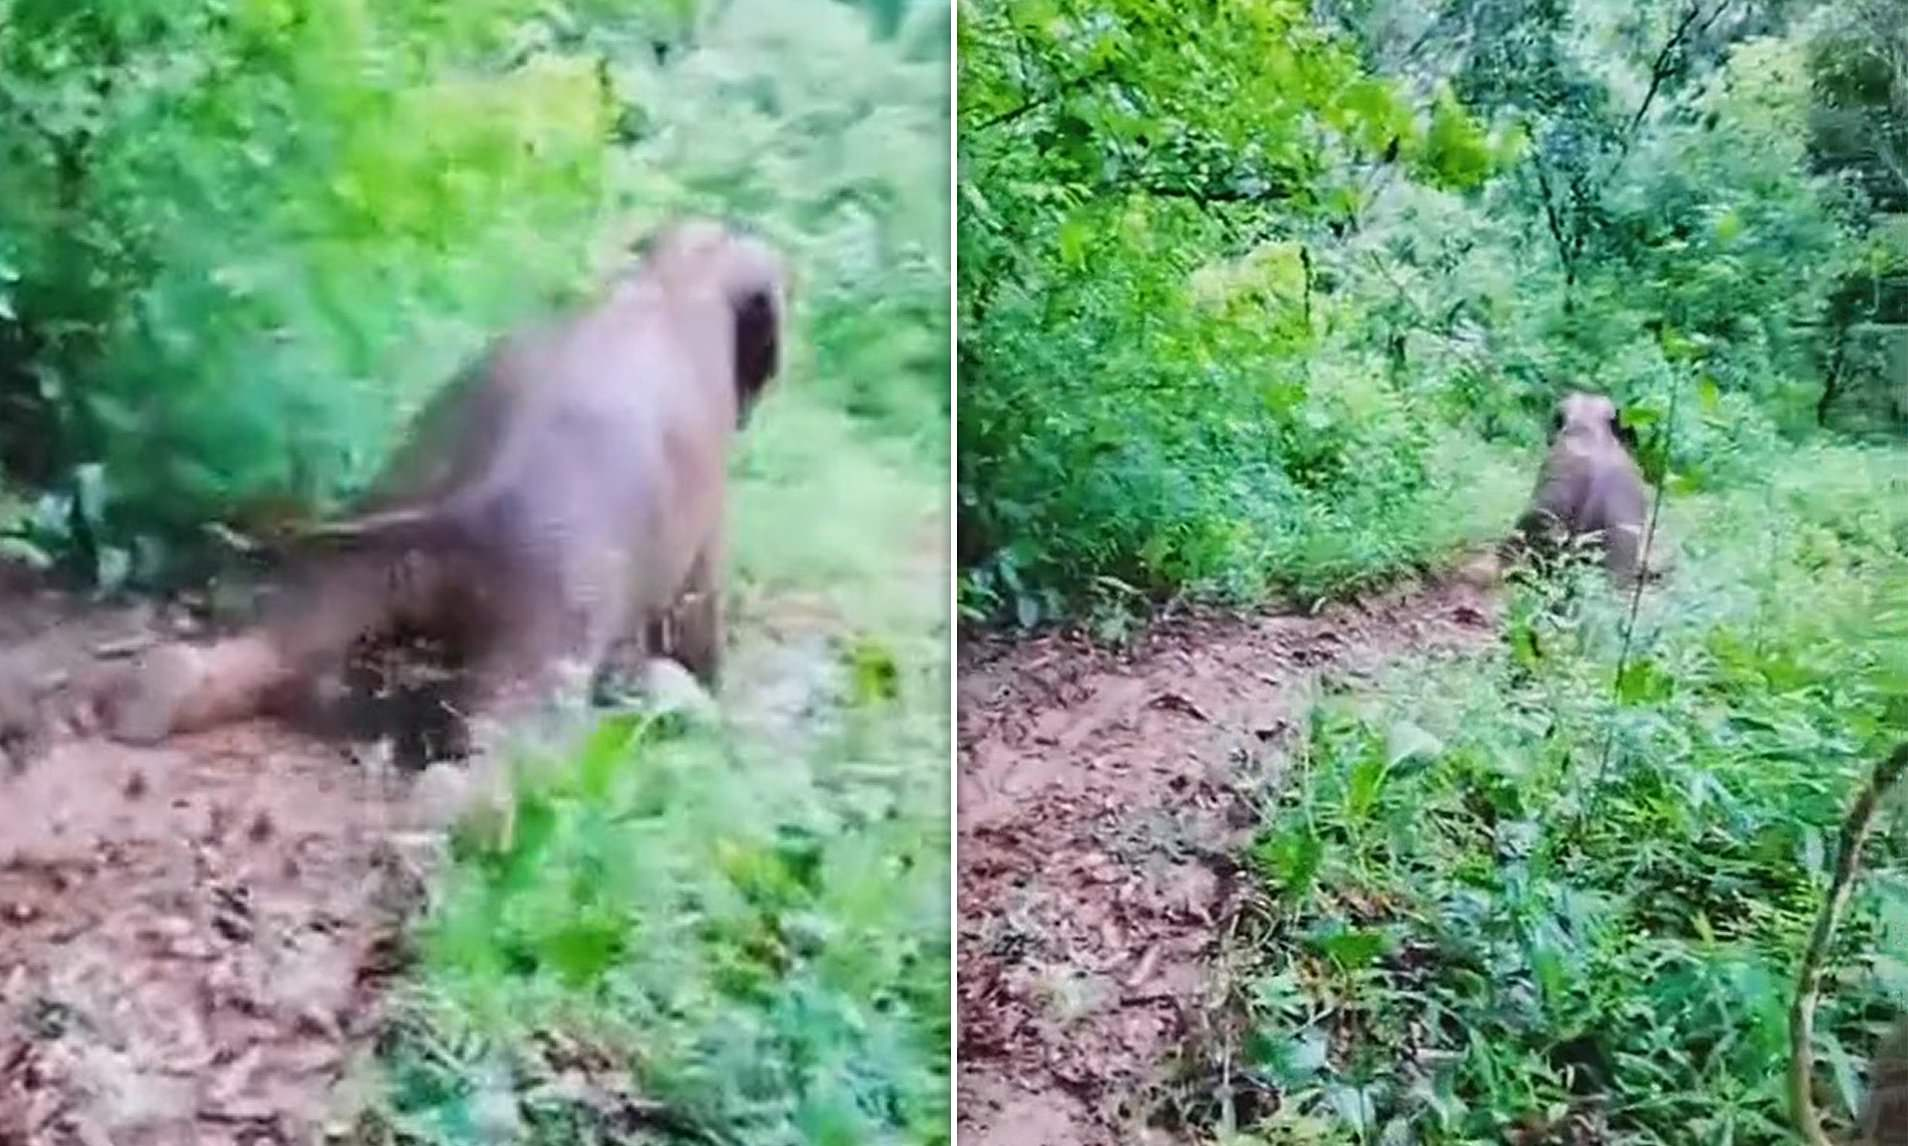 "Anak Gajah Main ""Perosotan"" di Tanah Berlumpur Hutan, Aksi Lucunya Terekam Kamera"